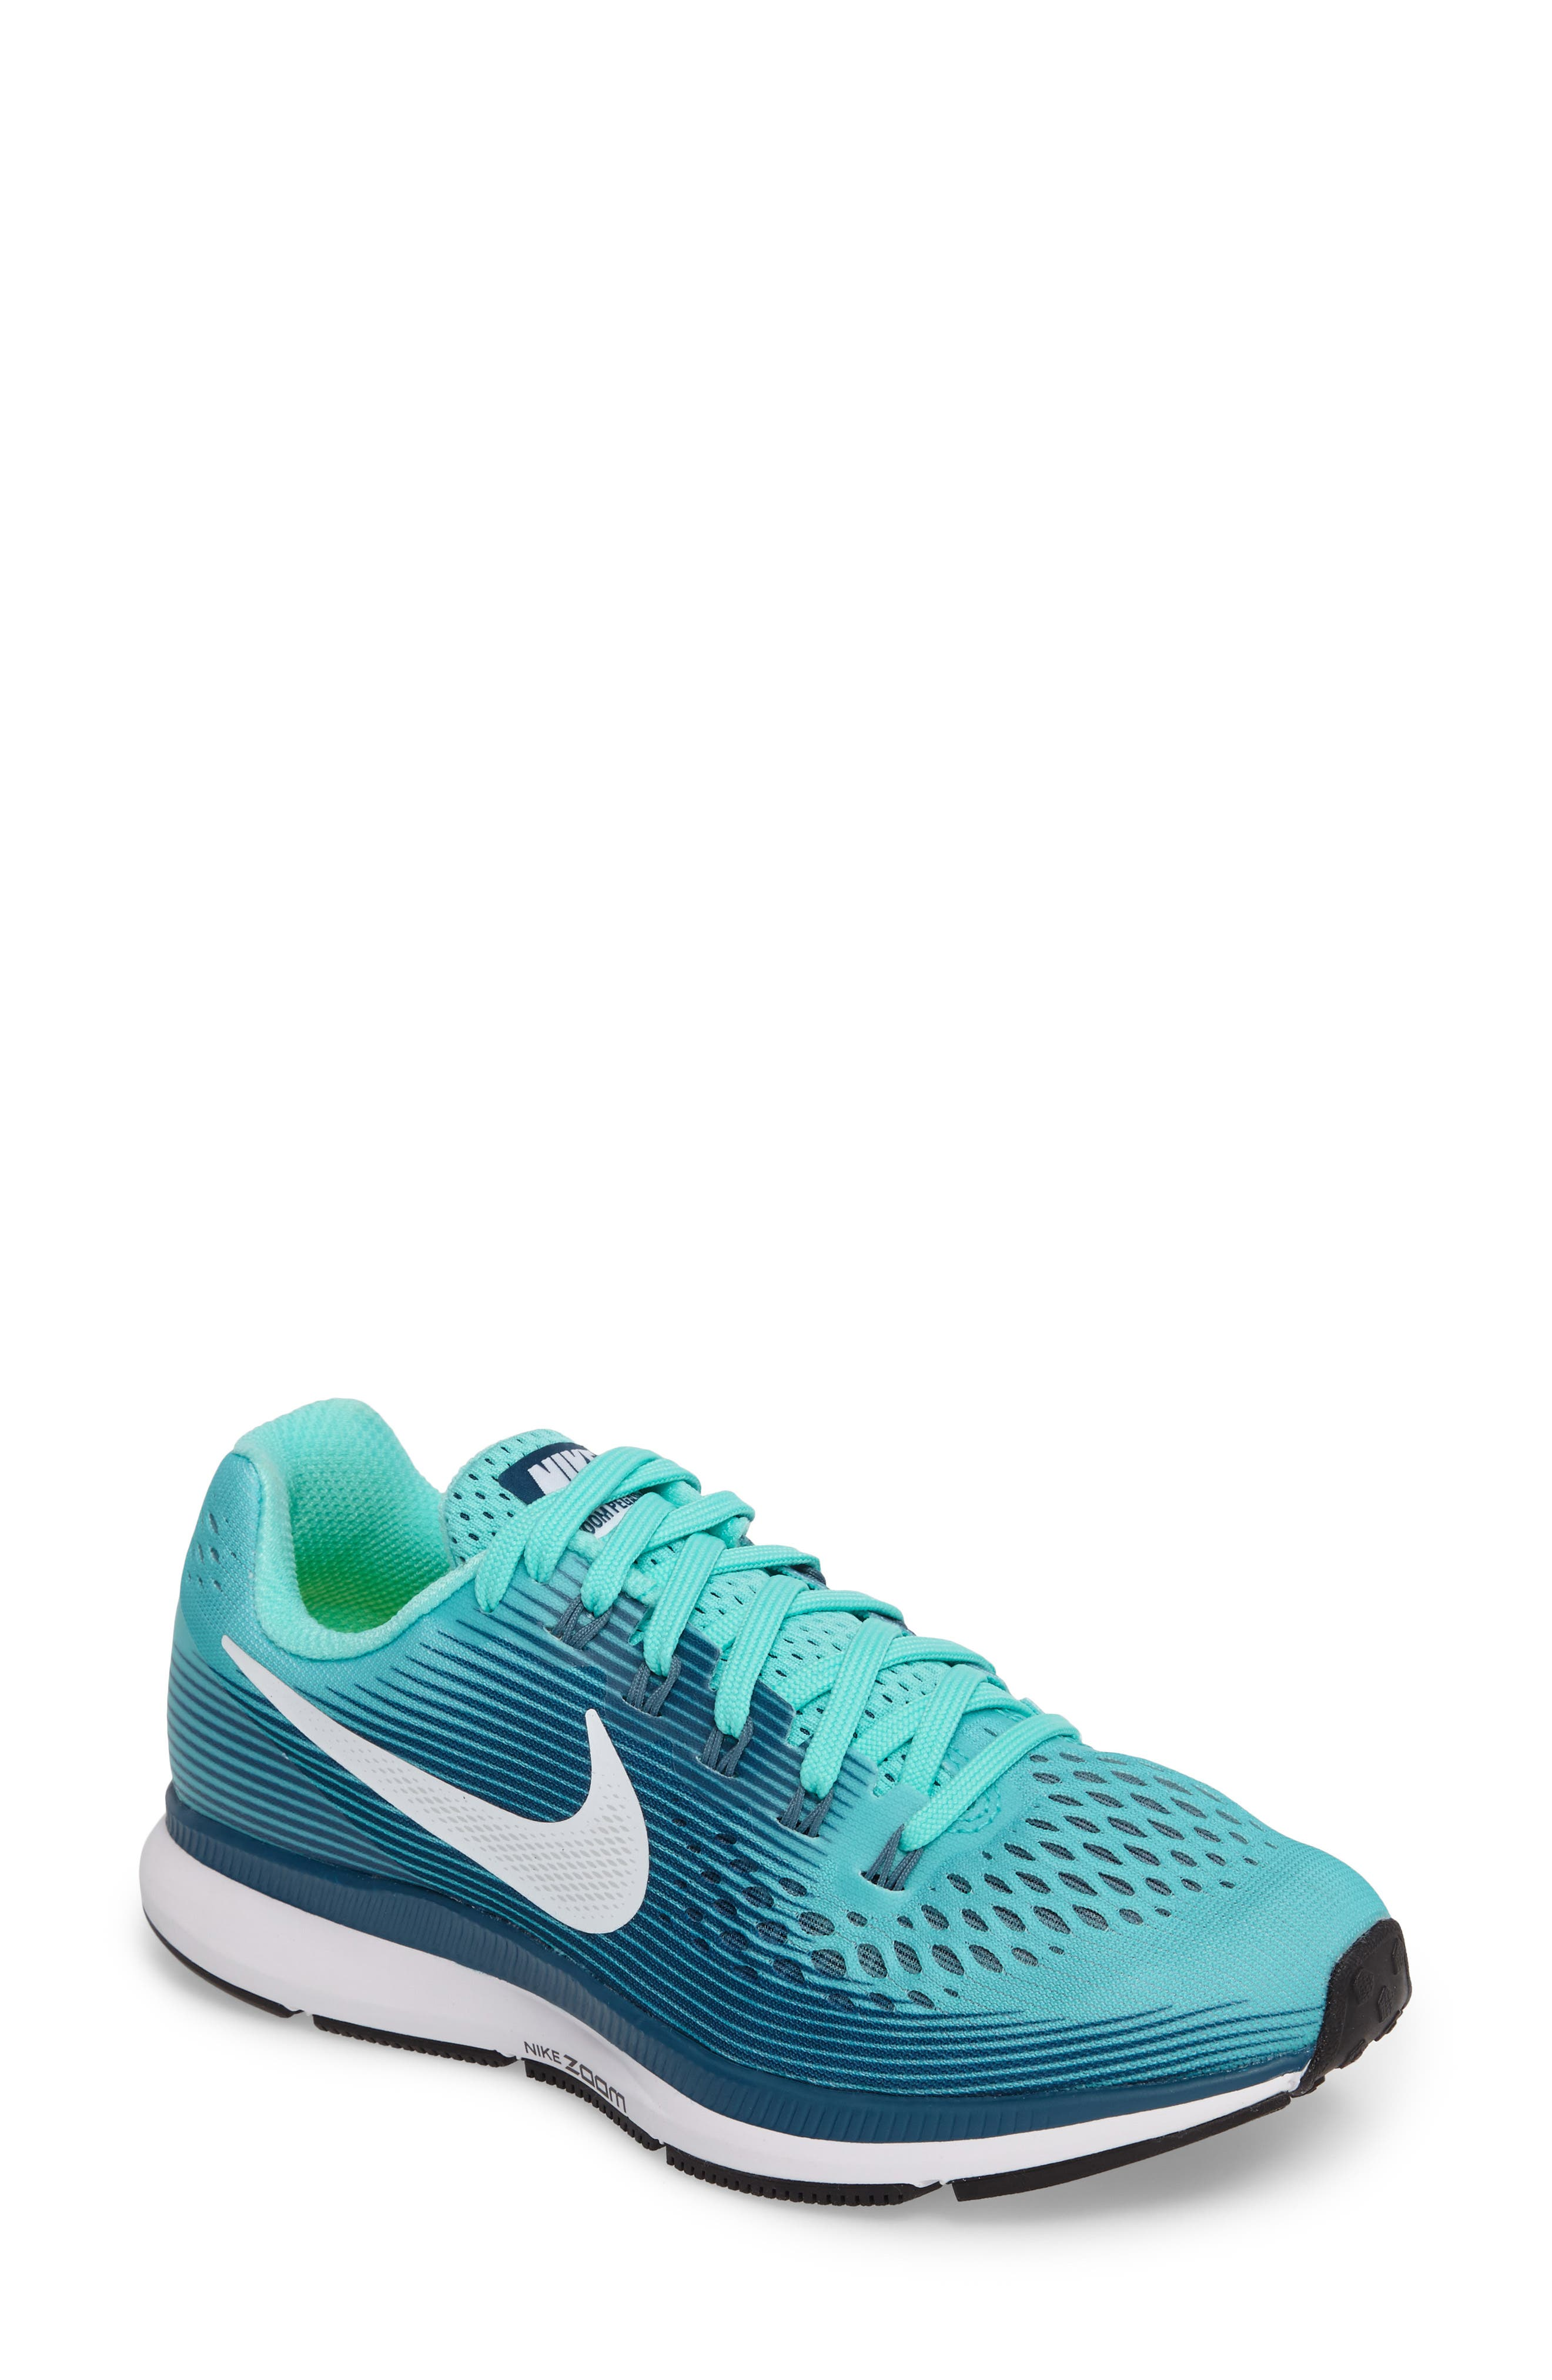 Alternate Image 1 Selected - Nike Air Zoom Pegasus 34 Running Shoe (Women)